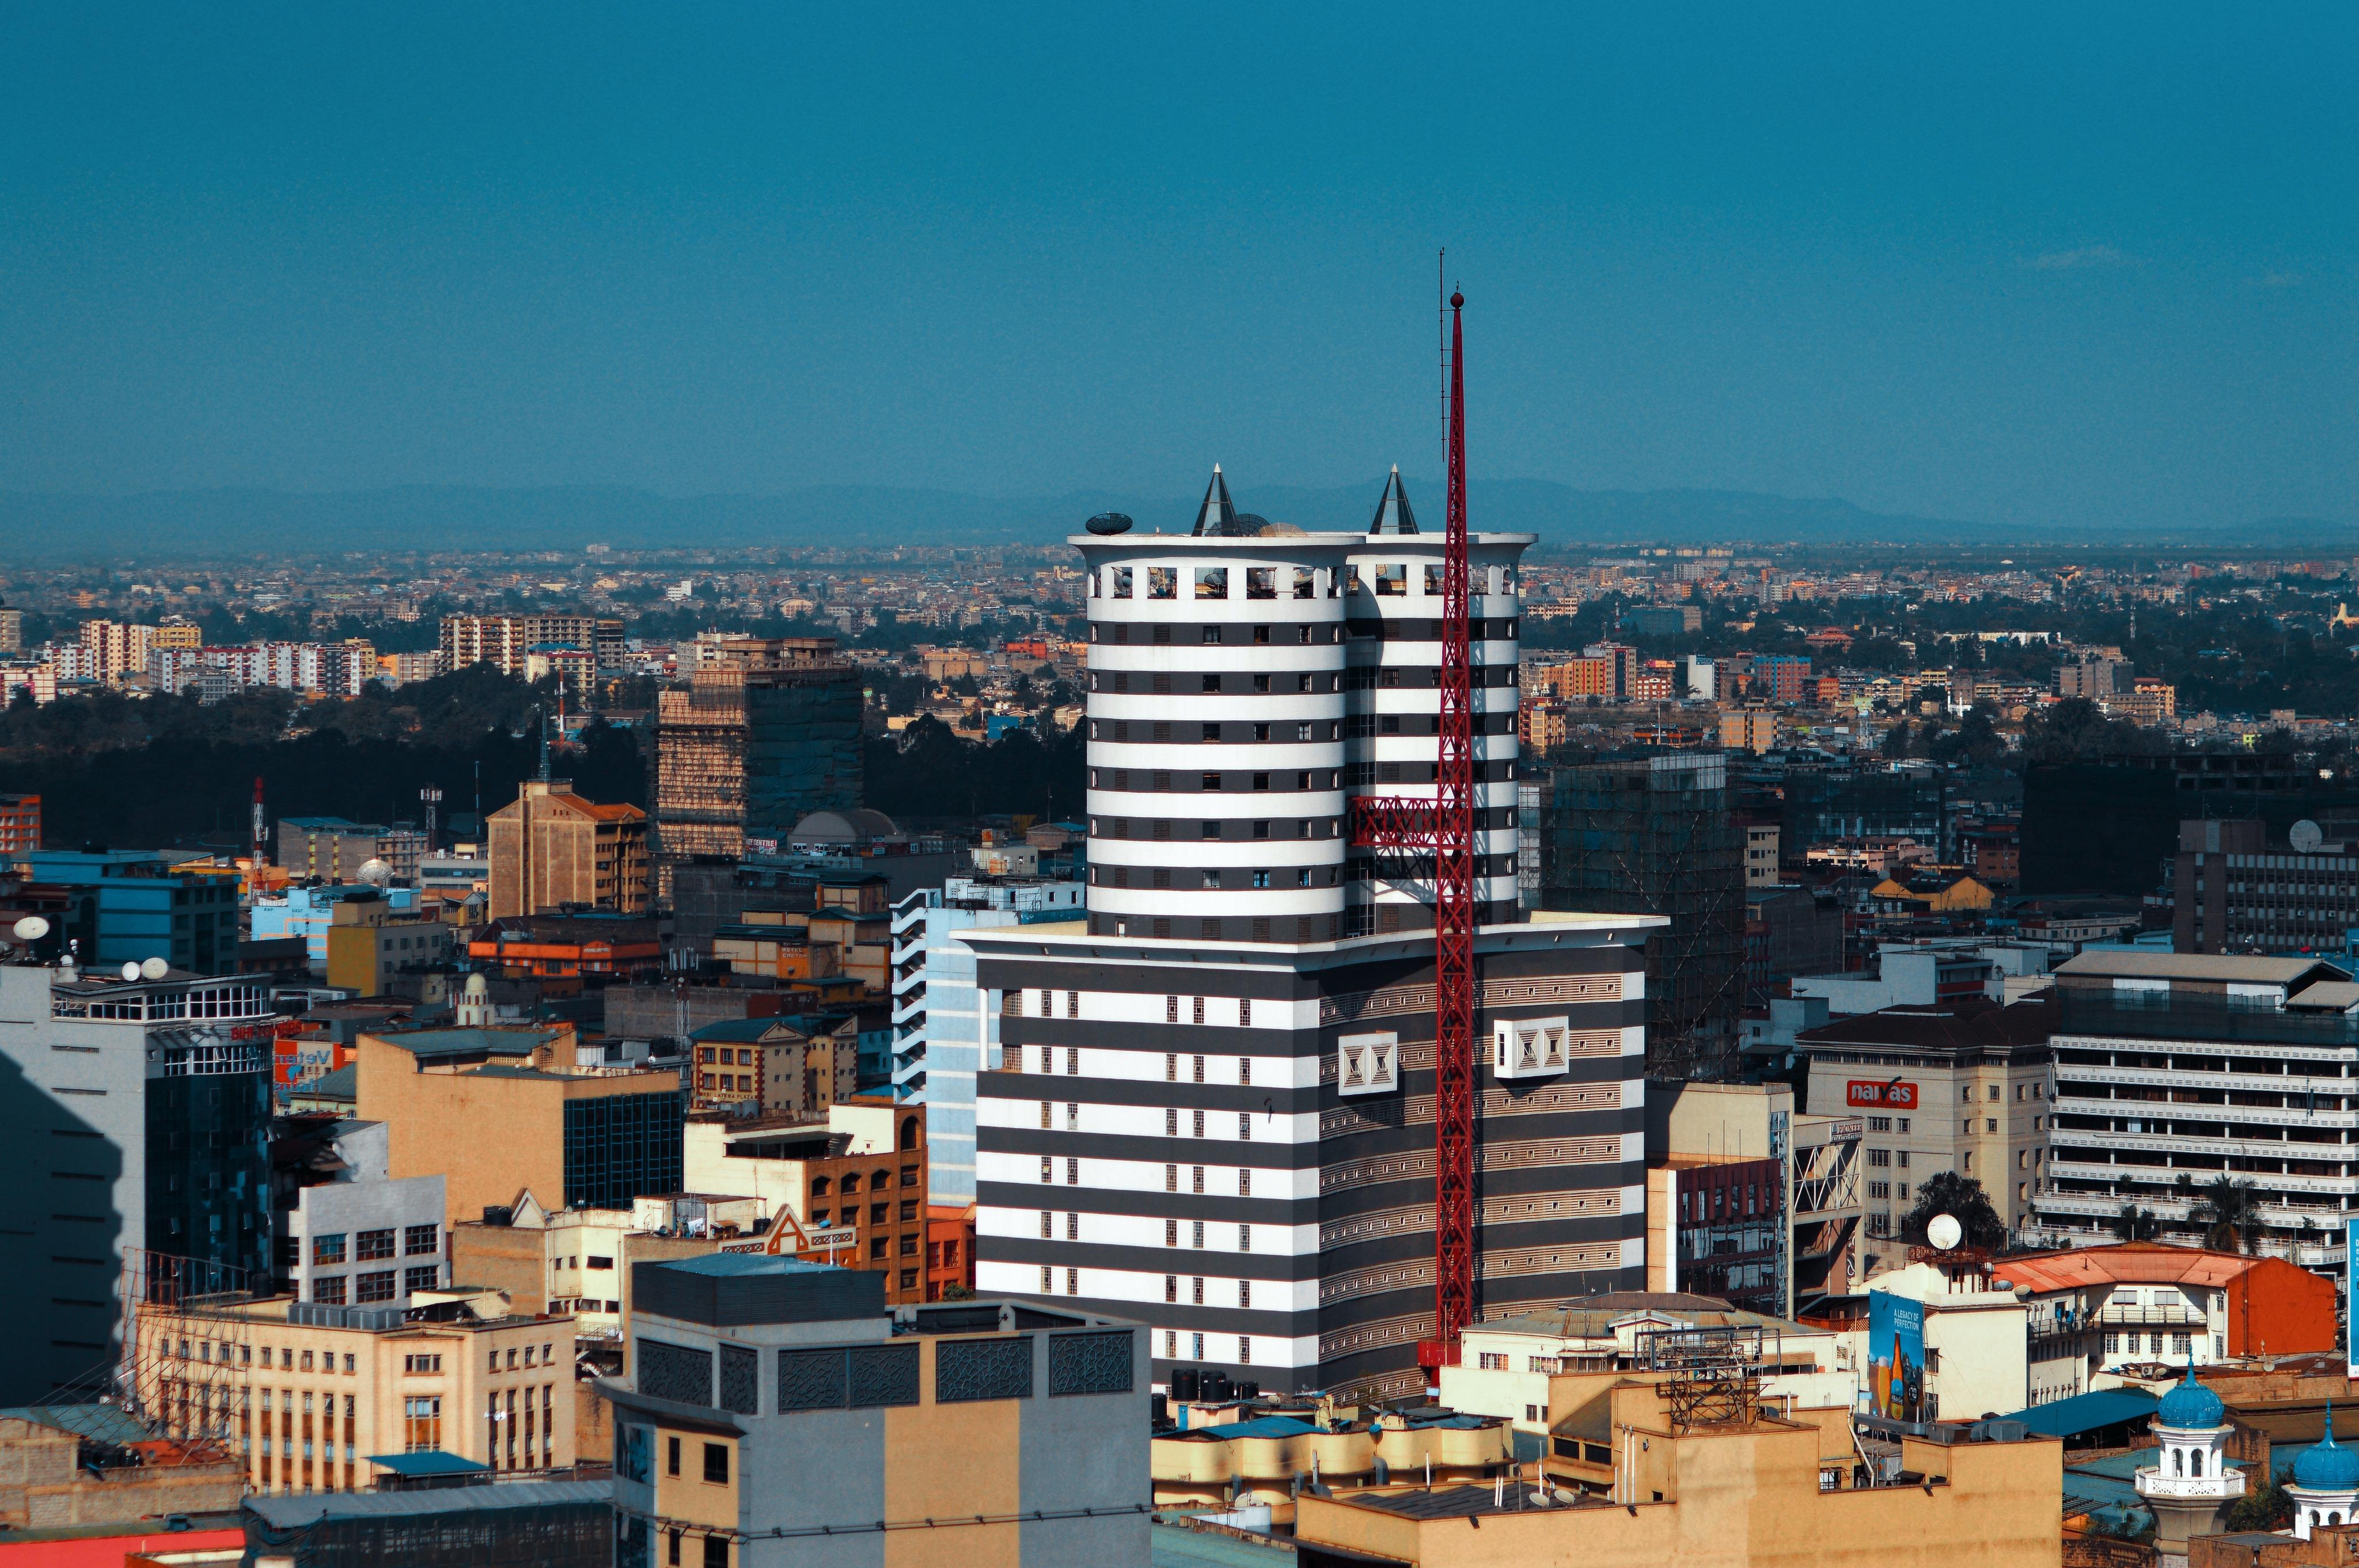 Naiorbi City